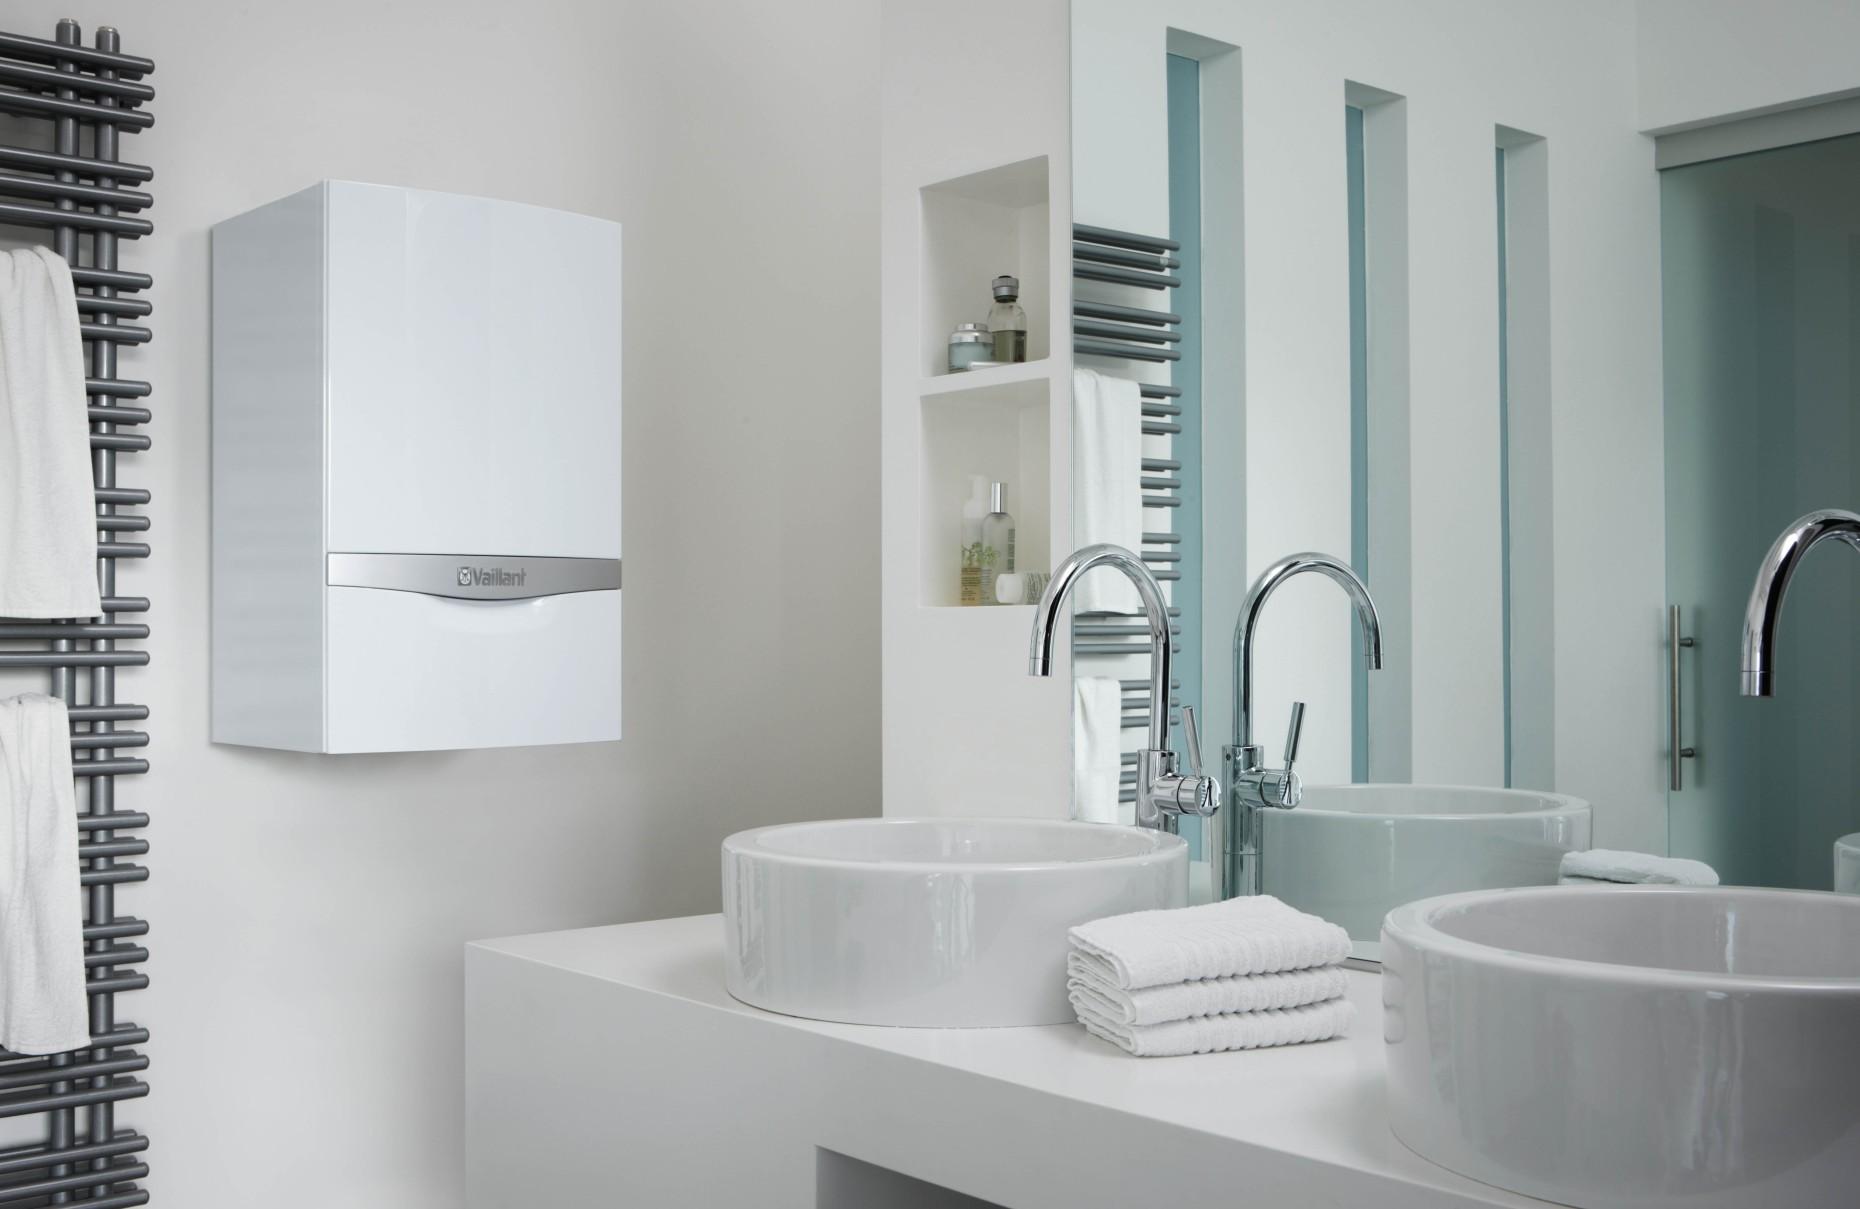 wandheizger t ecotec plus vc vcw vaillant. Black Bedroom Furniture Sets. Home Design Ideas